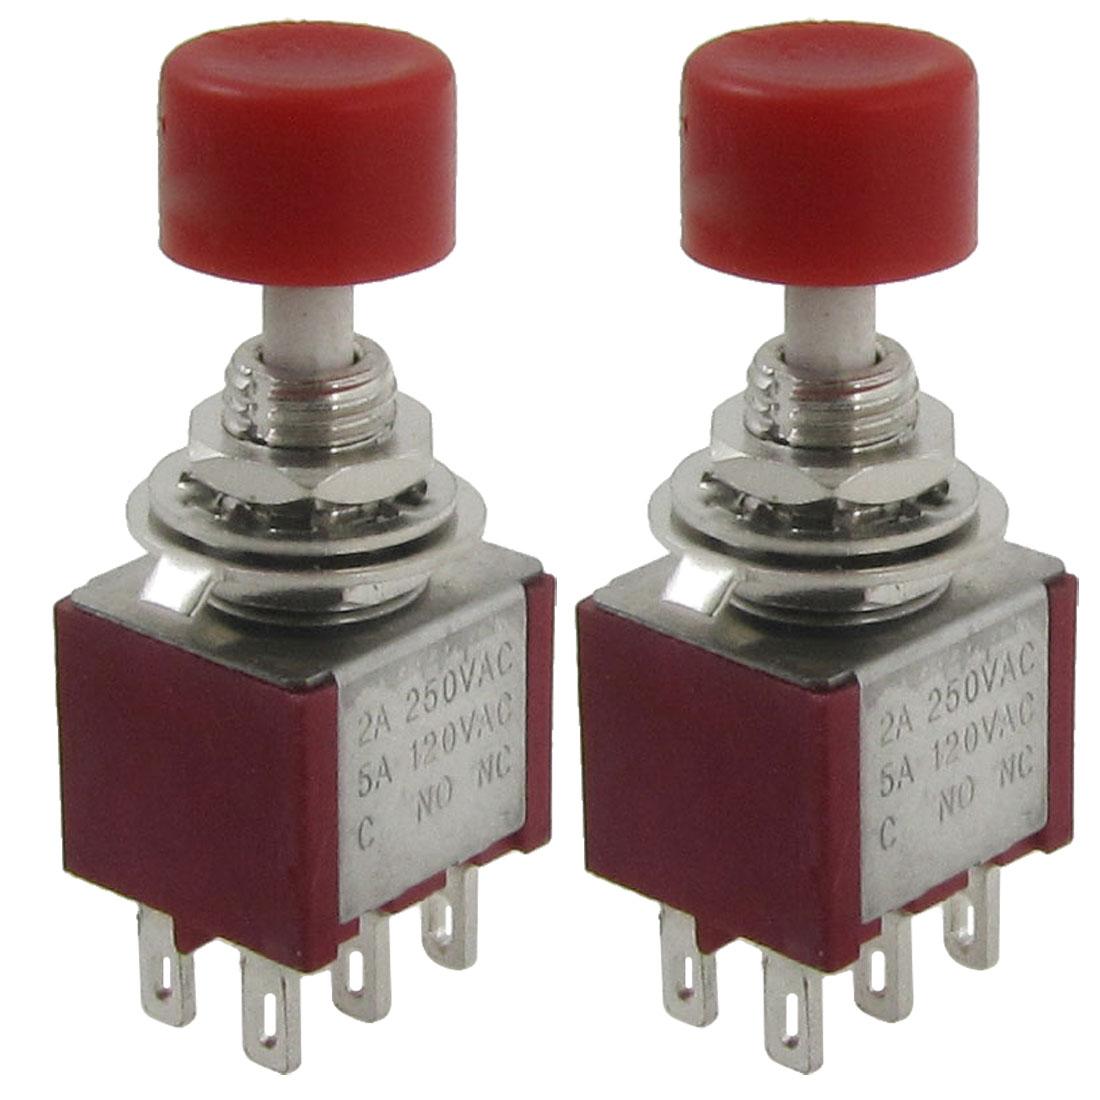 2 Pcs AC 250V 2A 120V 5A DPDT 2NO 2NC Momentary Push Button Switch